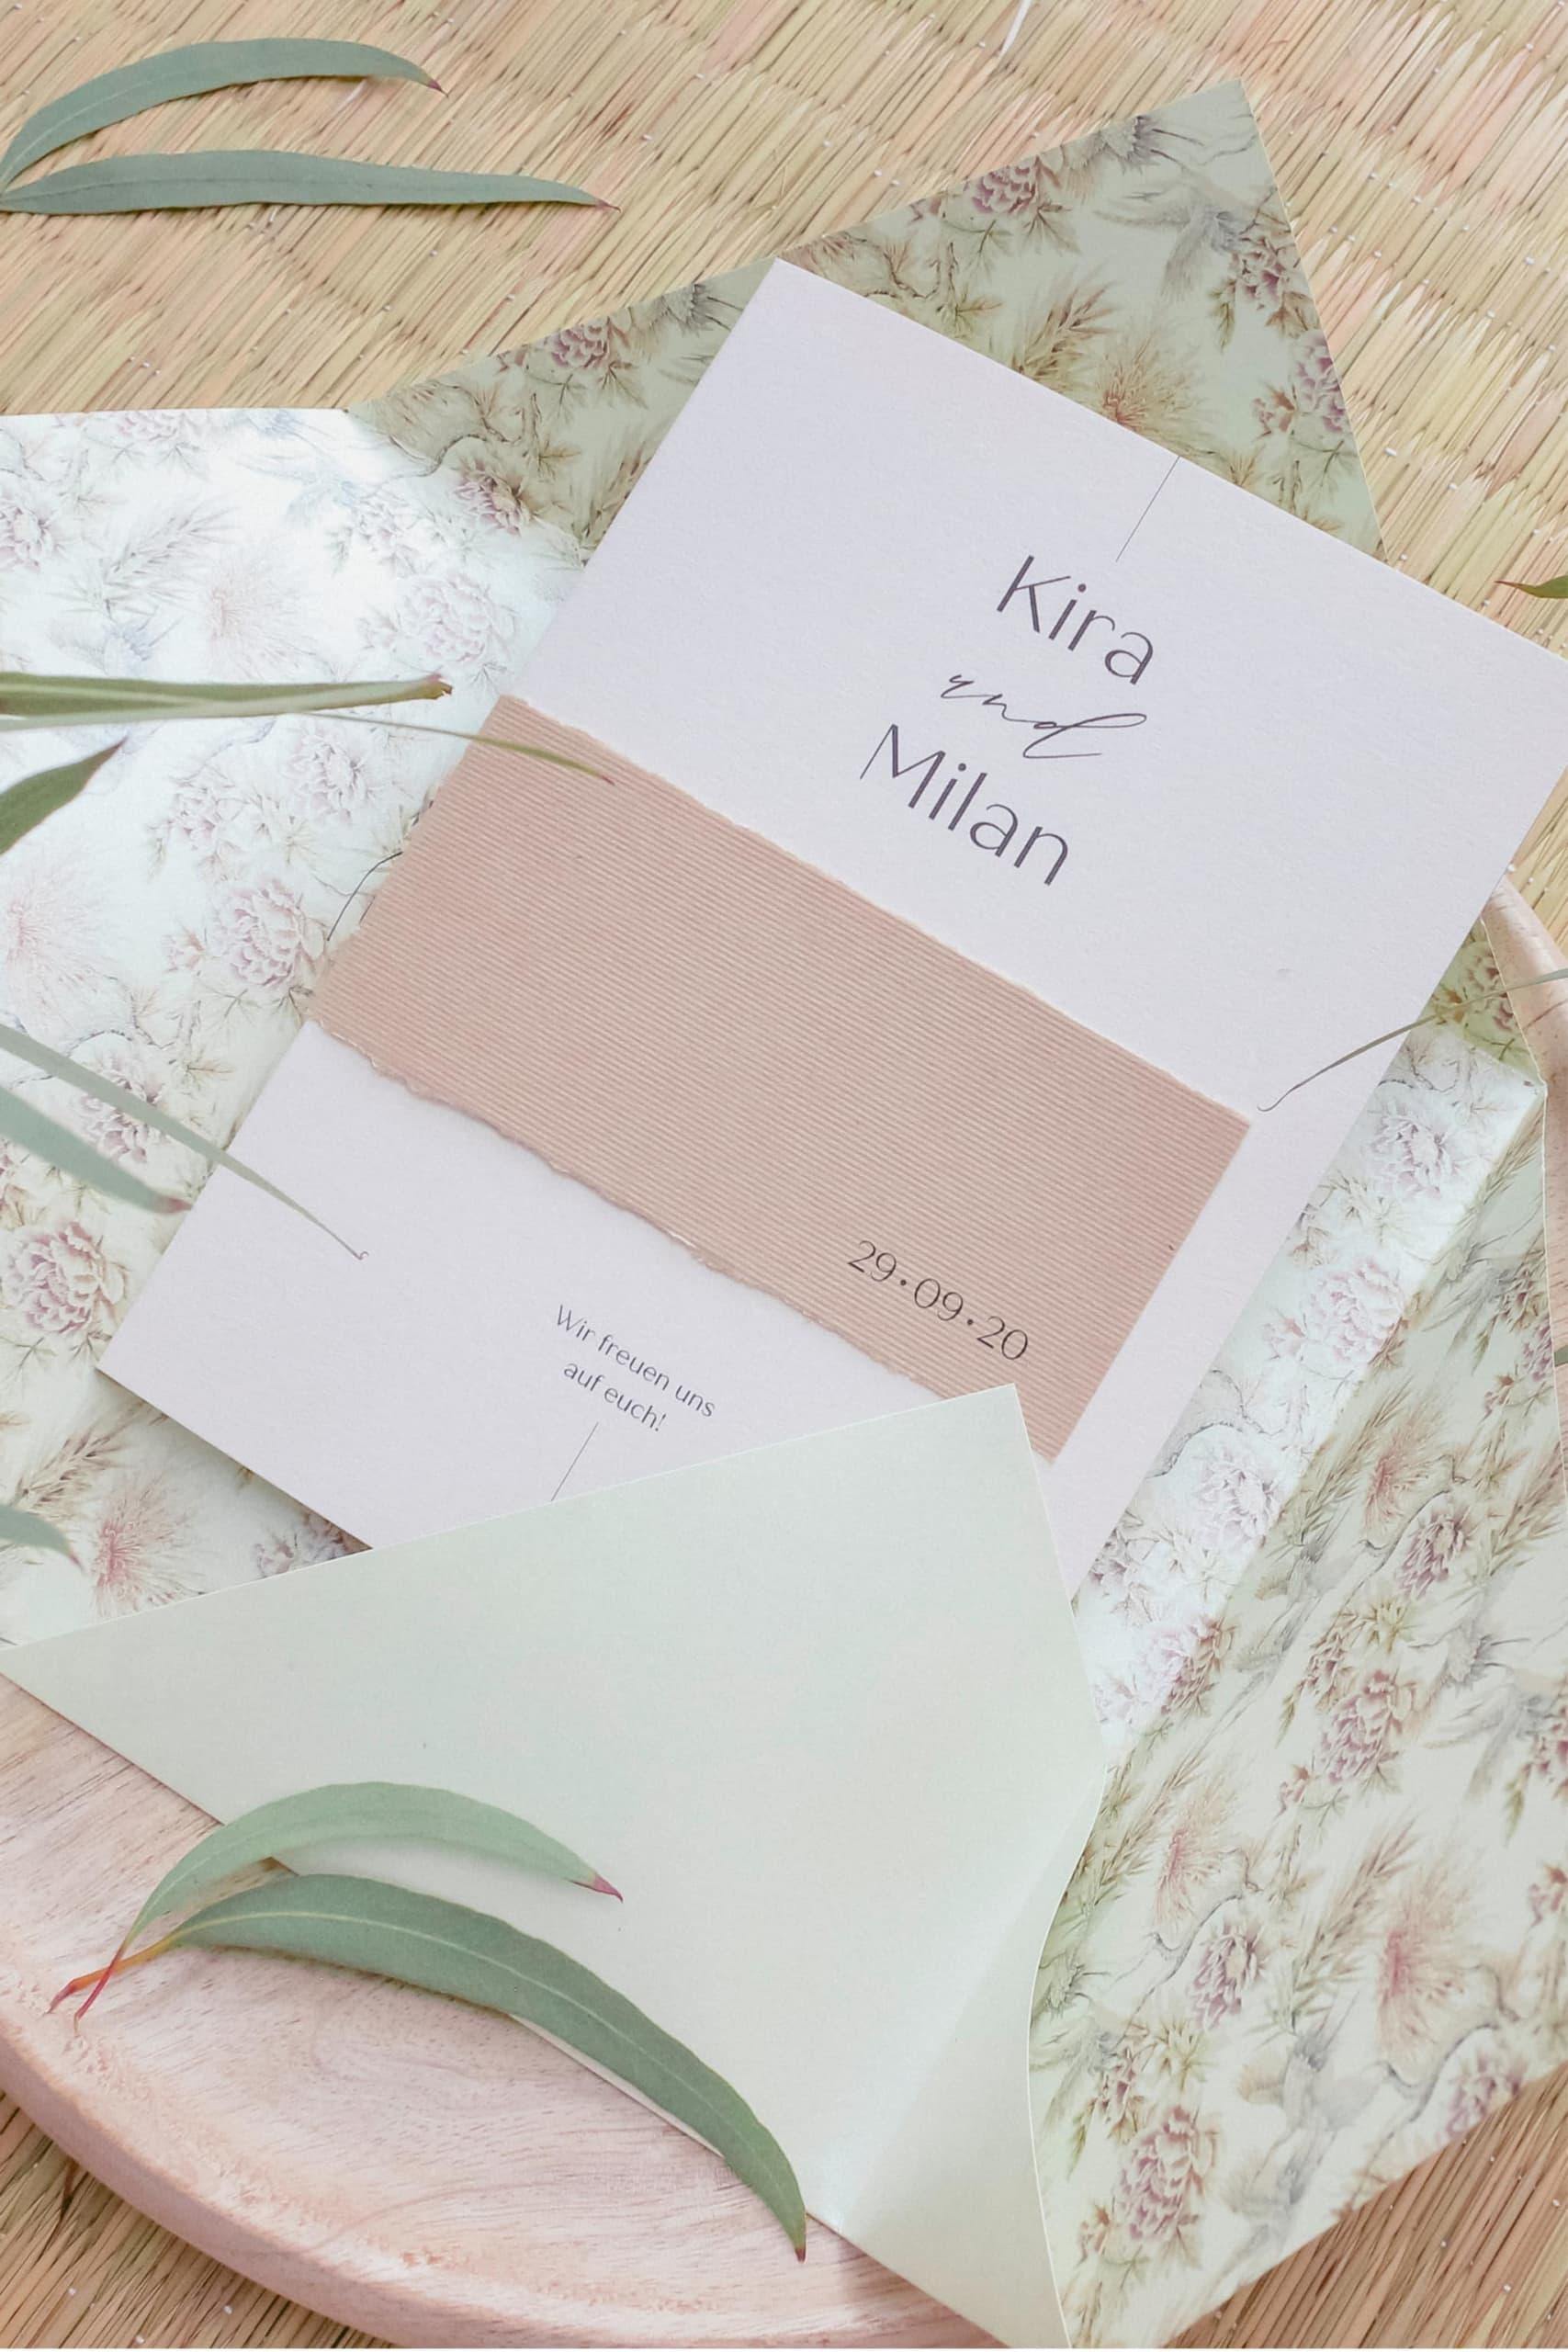 Miss Hanam Tokio Einladung